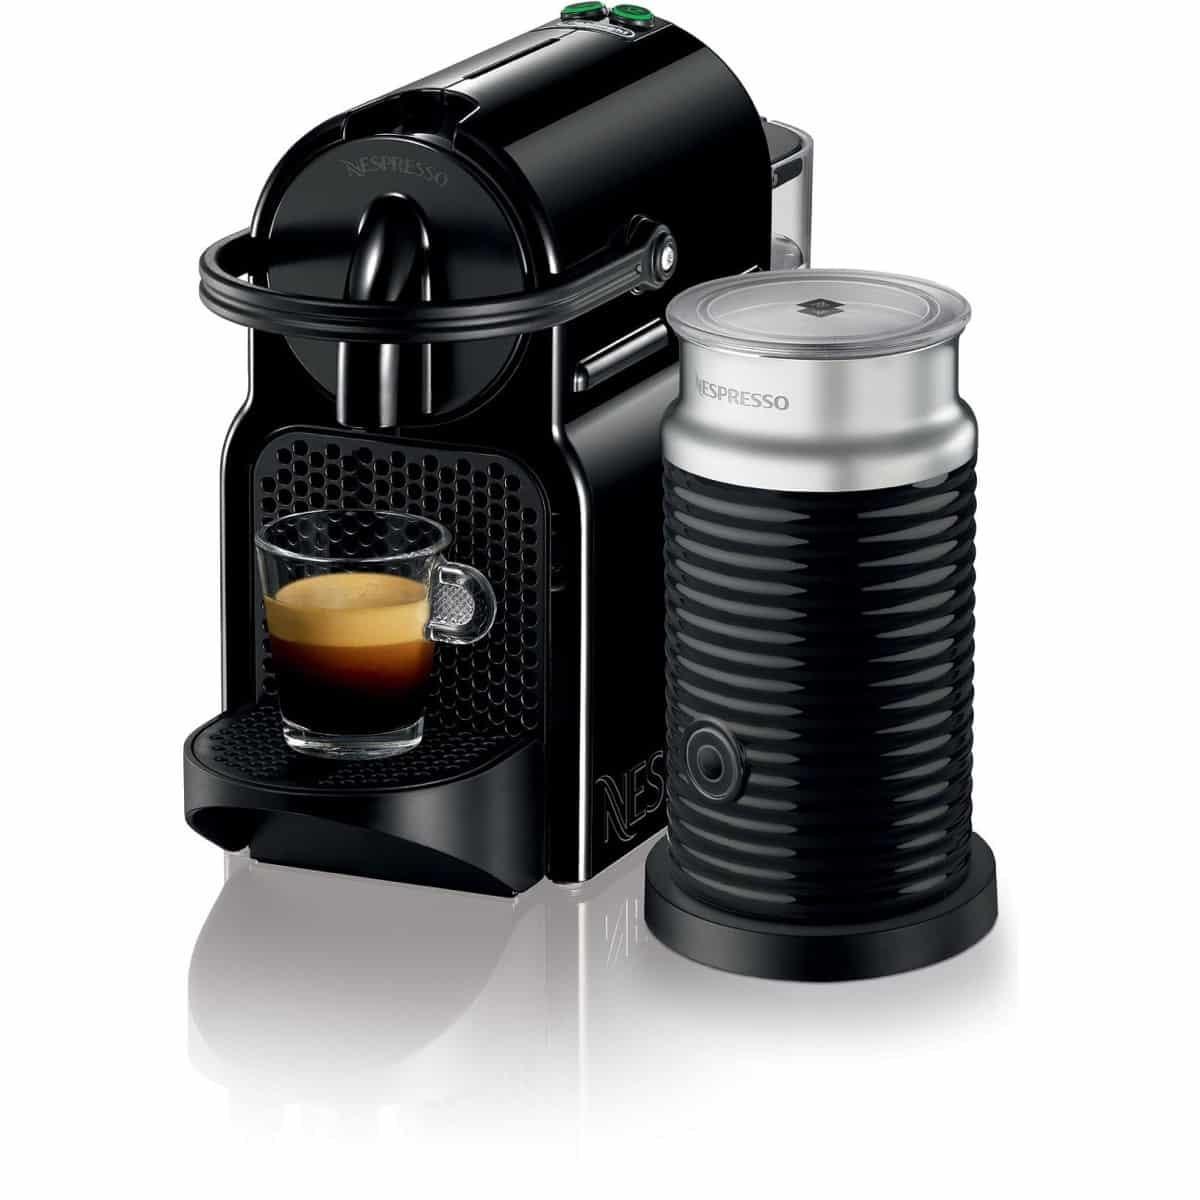 Nespresso Inissia Bundle Coffee Machine - Black